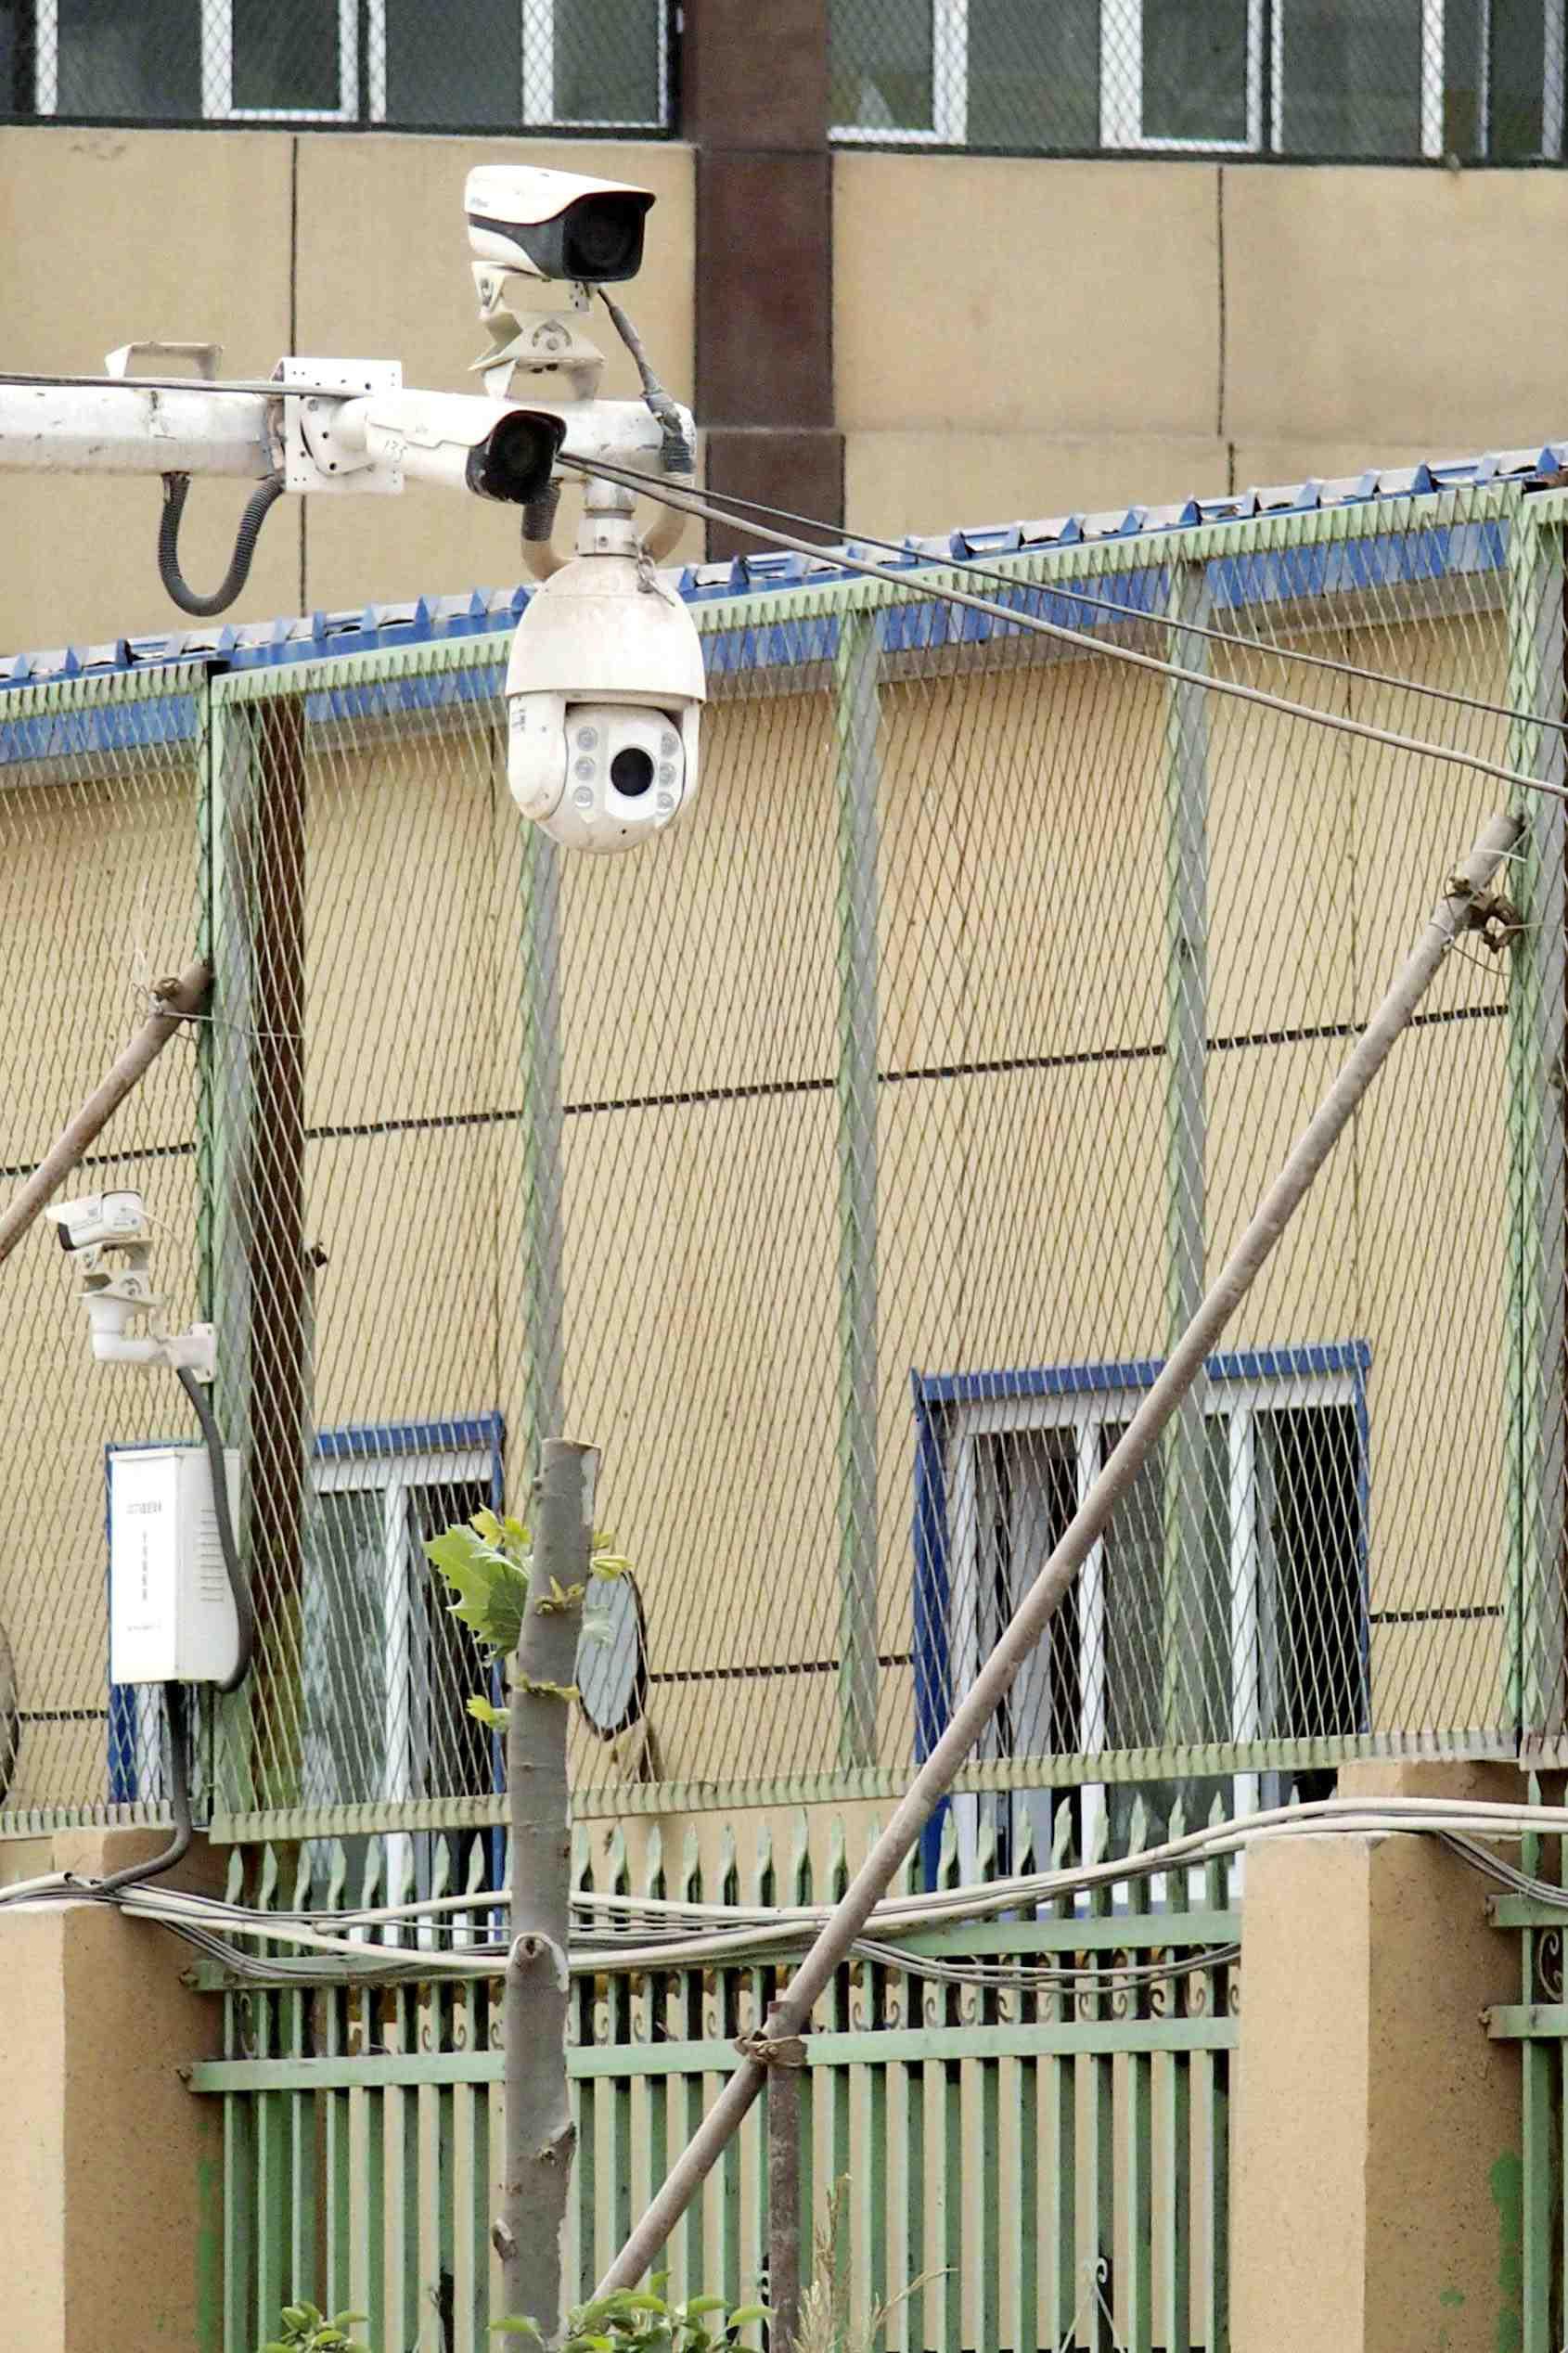 Uyghur Leader in Japan China Spy Human rights 007